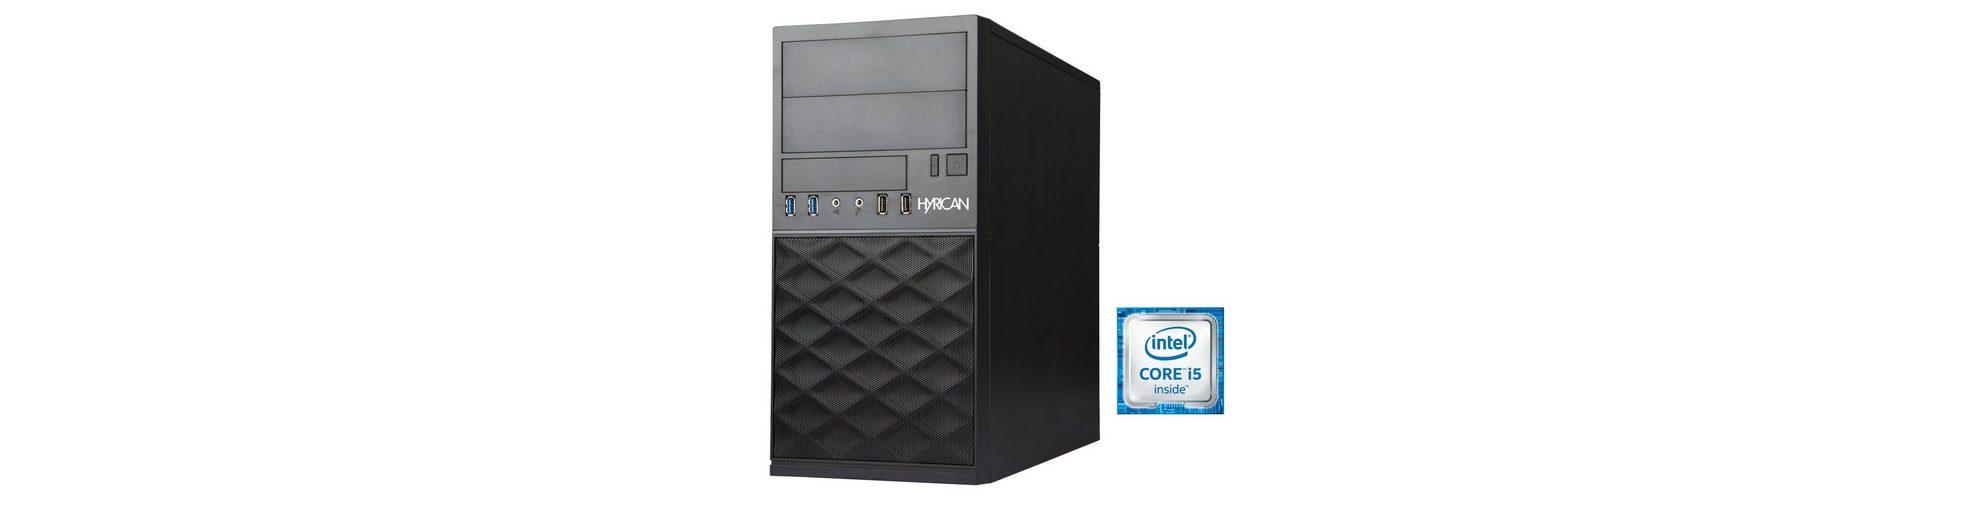 Hyrican Business PC Intel® Core™ i5-6500, 8GB, 240GB, Windows 10 Pro »Business PC CTS00344«